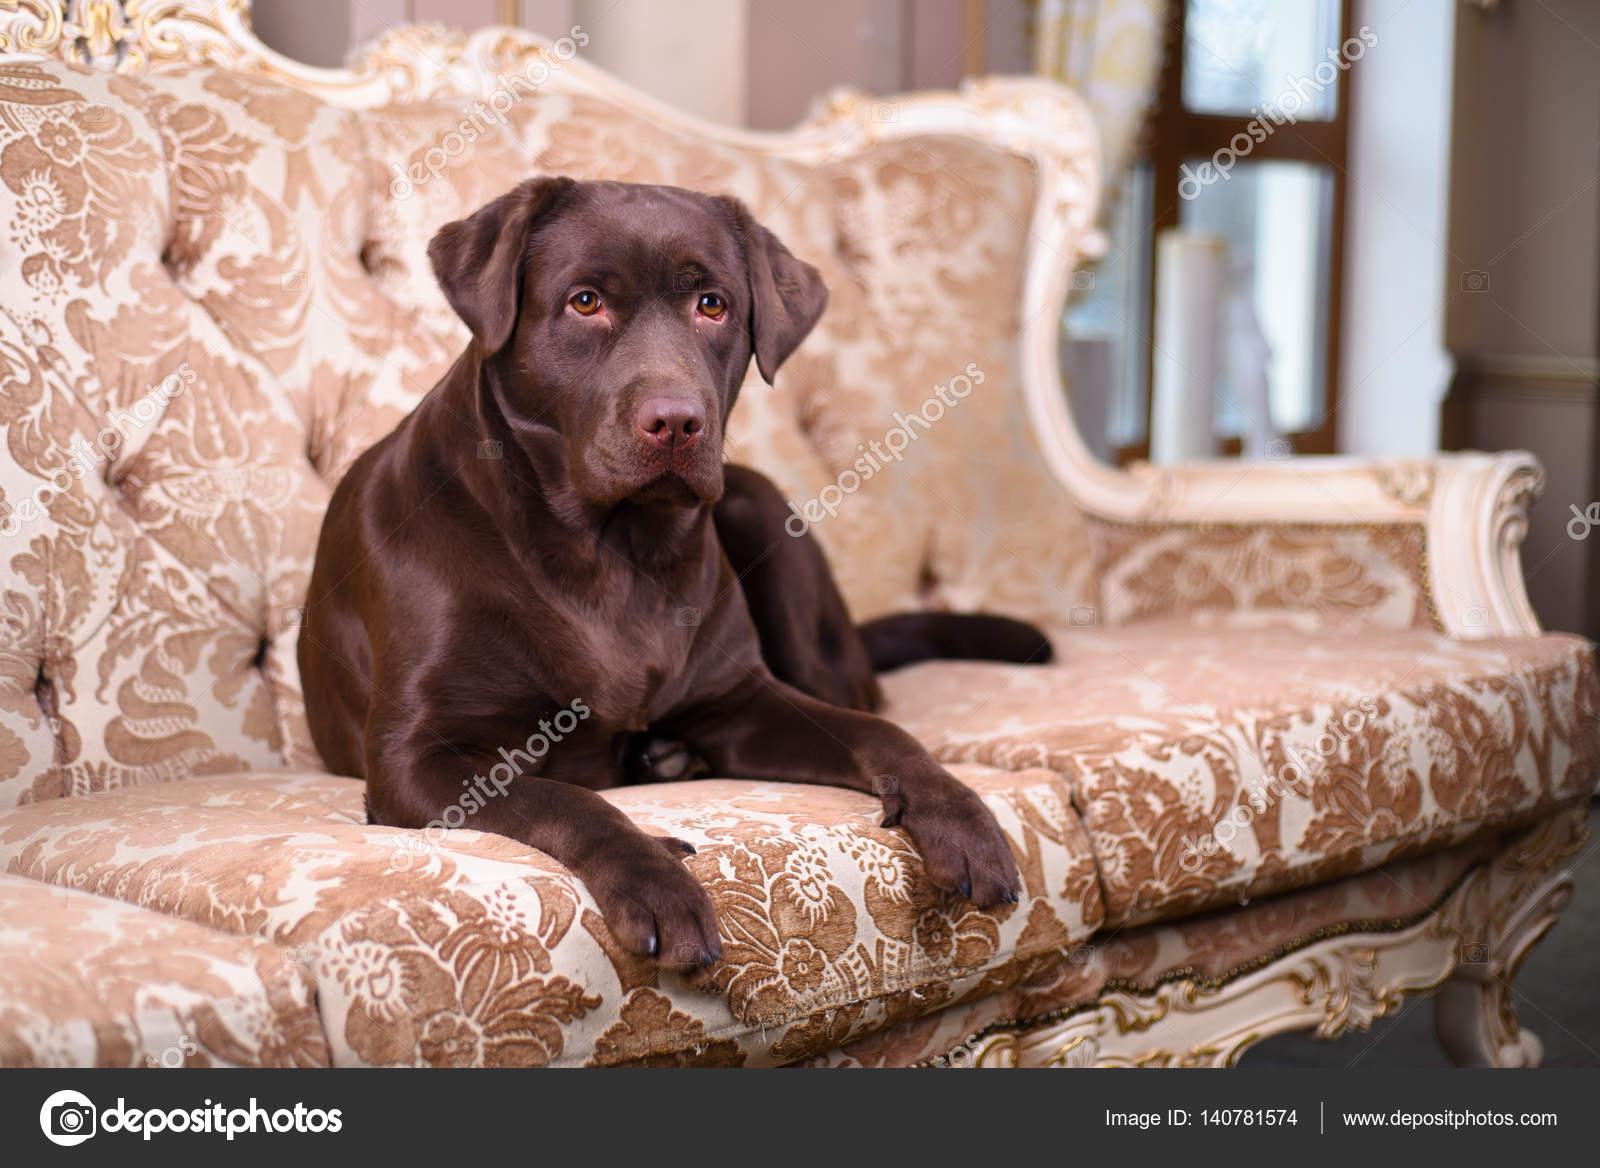 Woonkamer Vintage Bank : Bruine labrador puppy liggend op een luxe vintage bank u stockfoto